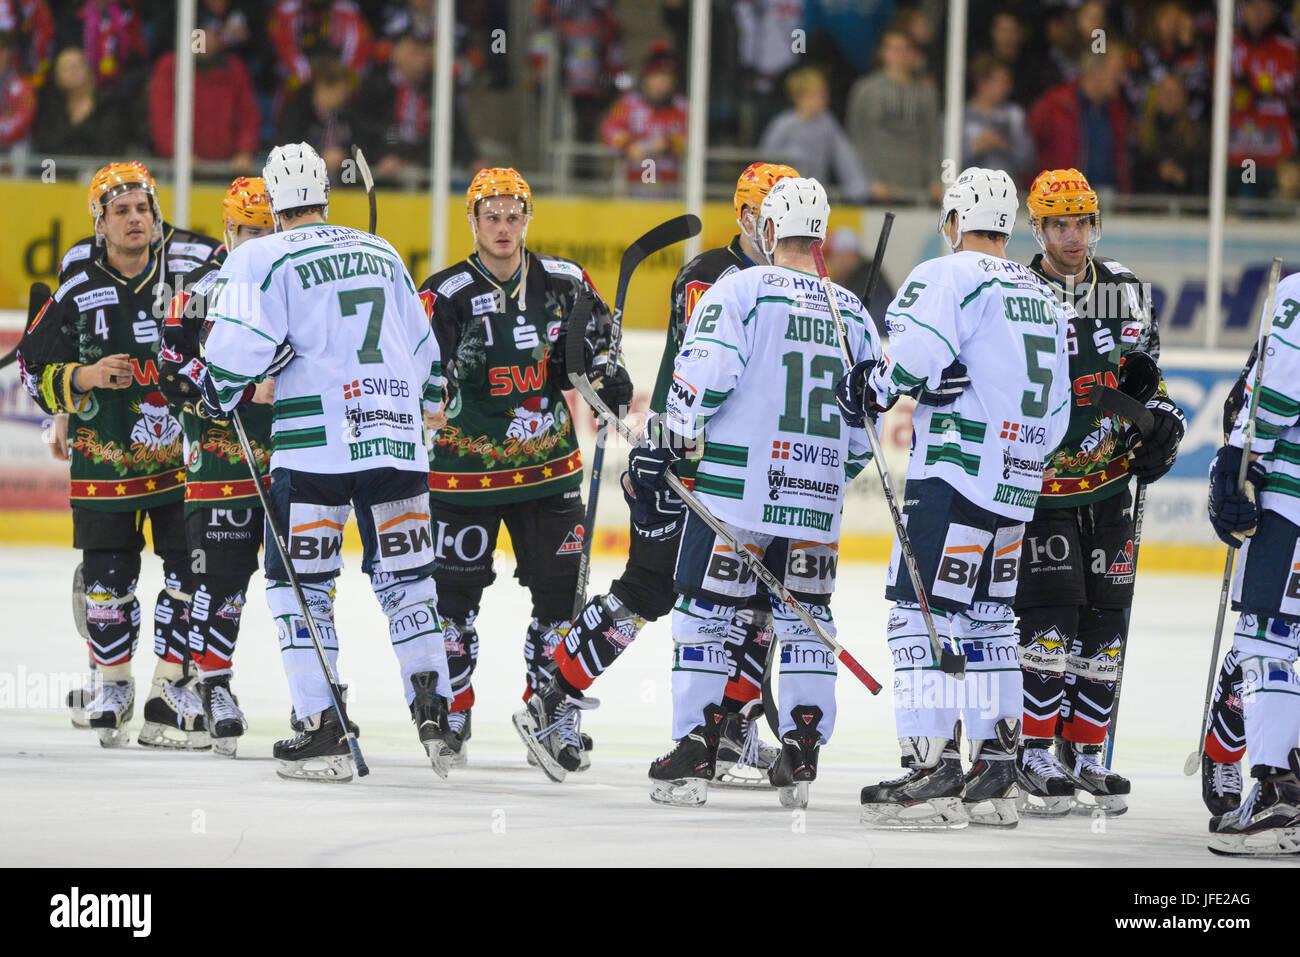 Icehockey Fishtown Pinguins vs. Bietigheim - Stock Image